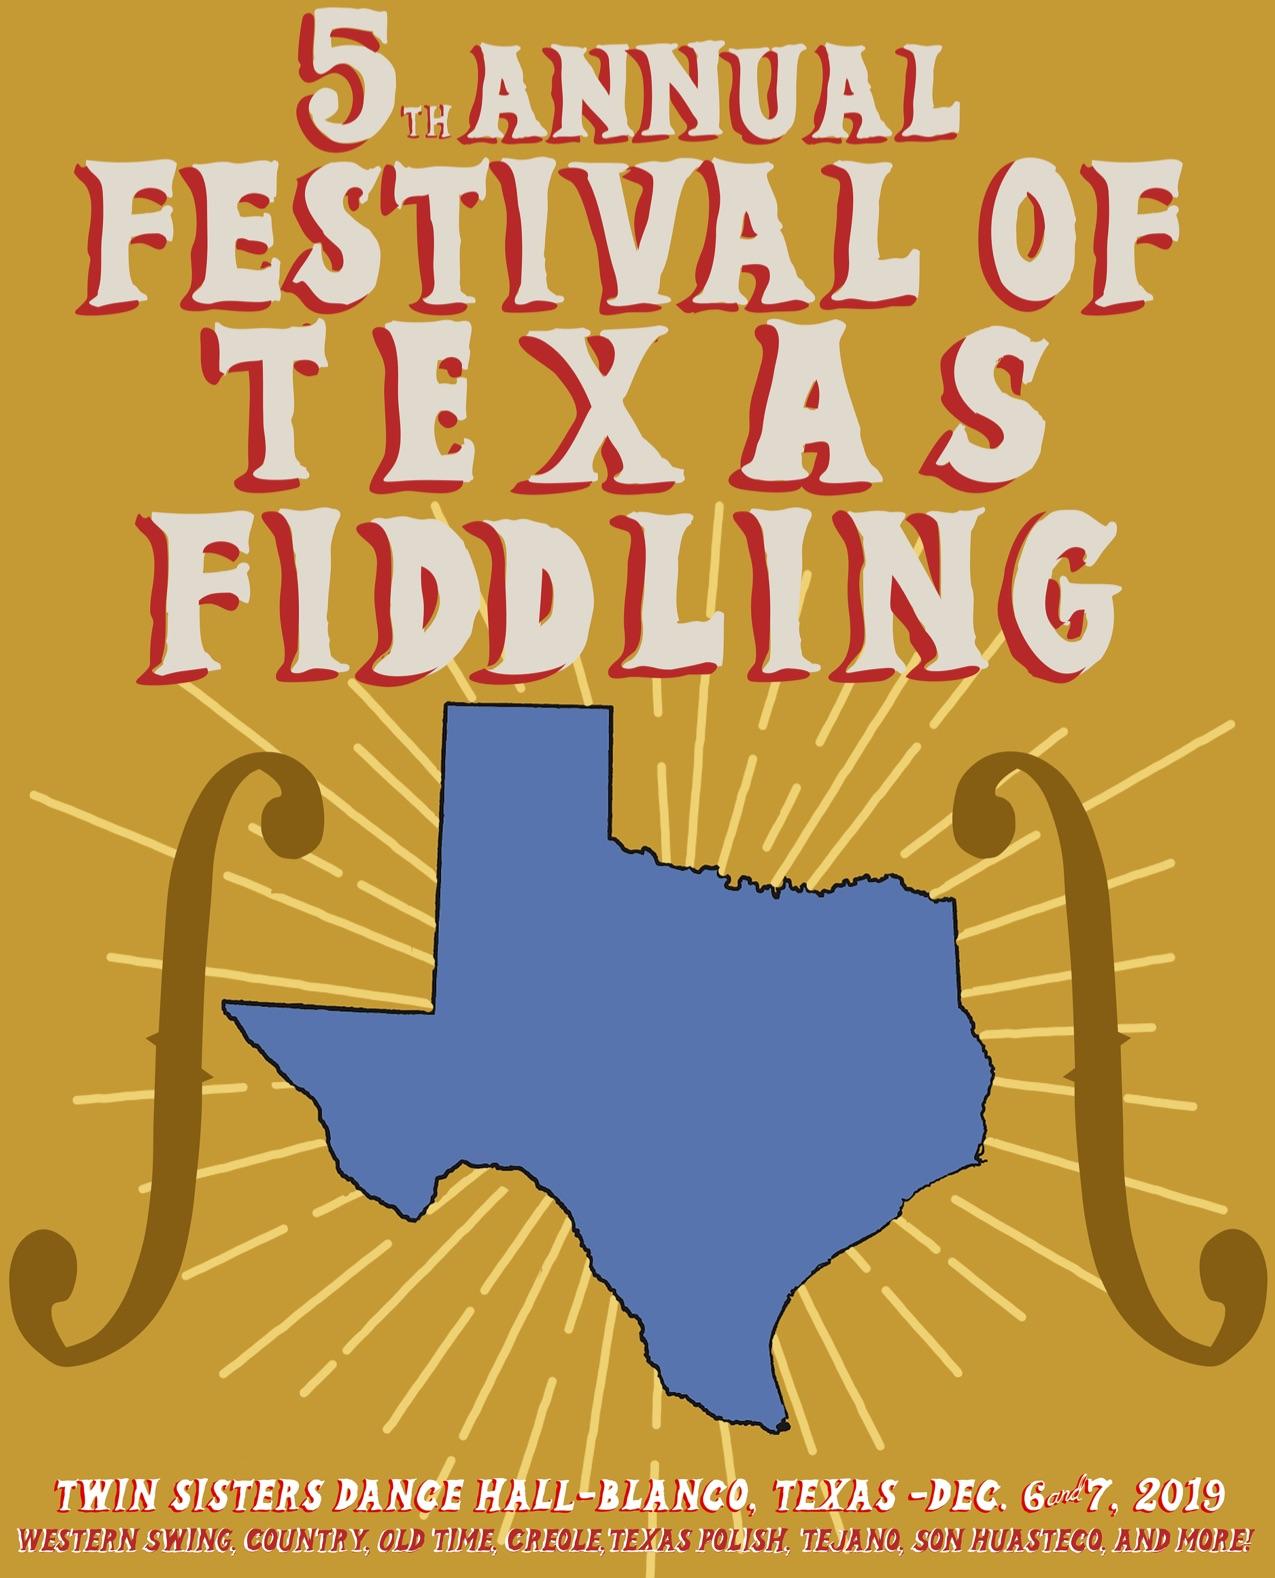 www.thefestivaloftexasfiddling.com